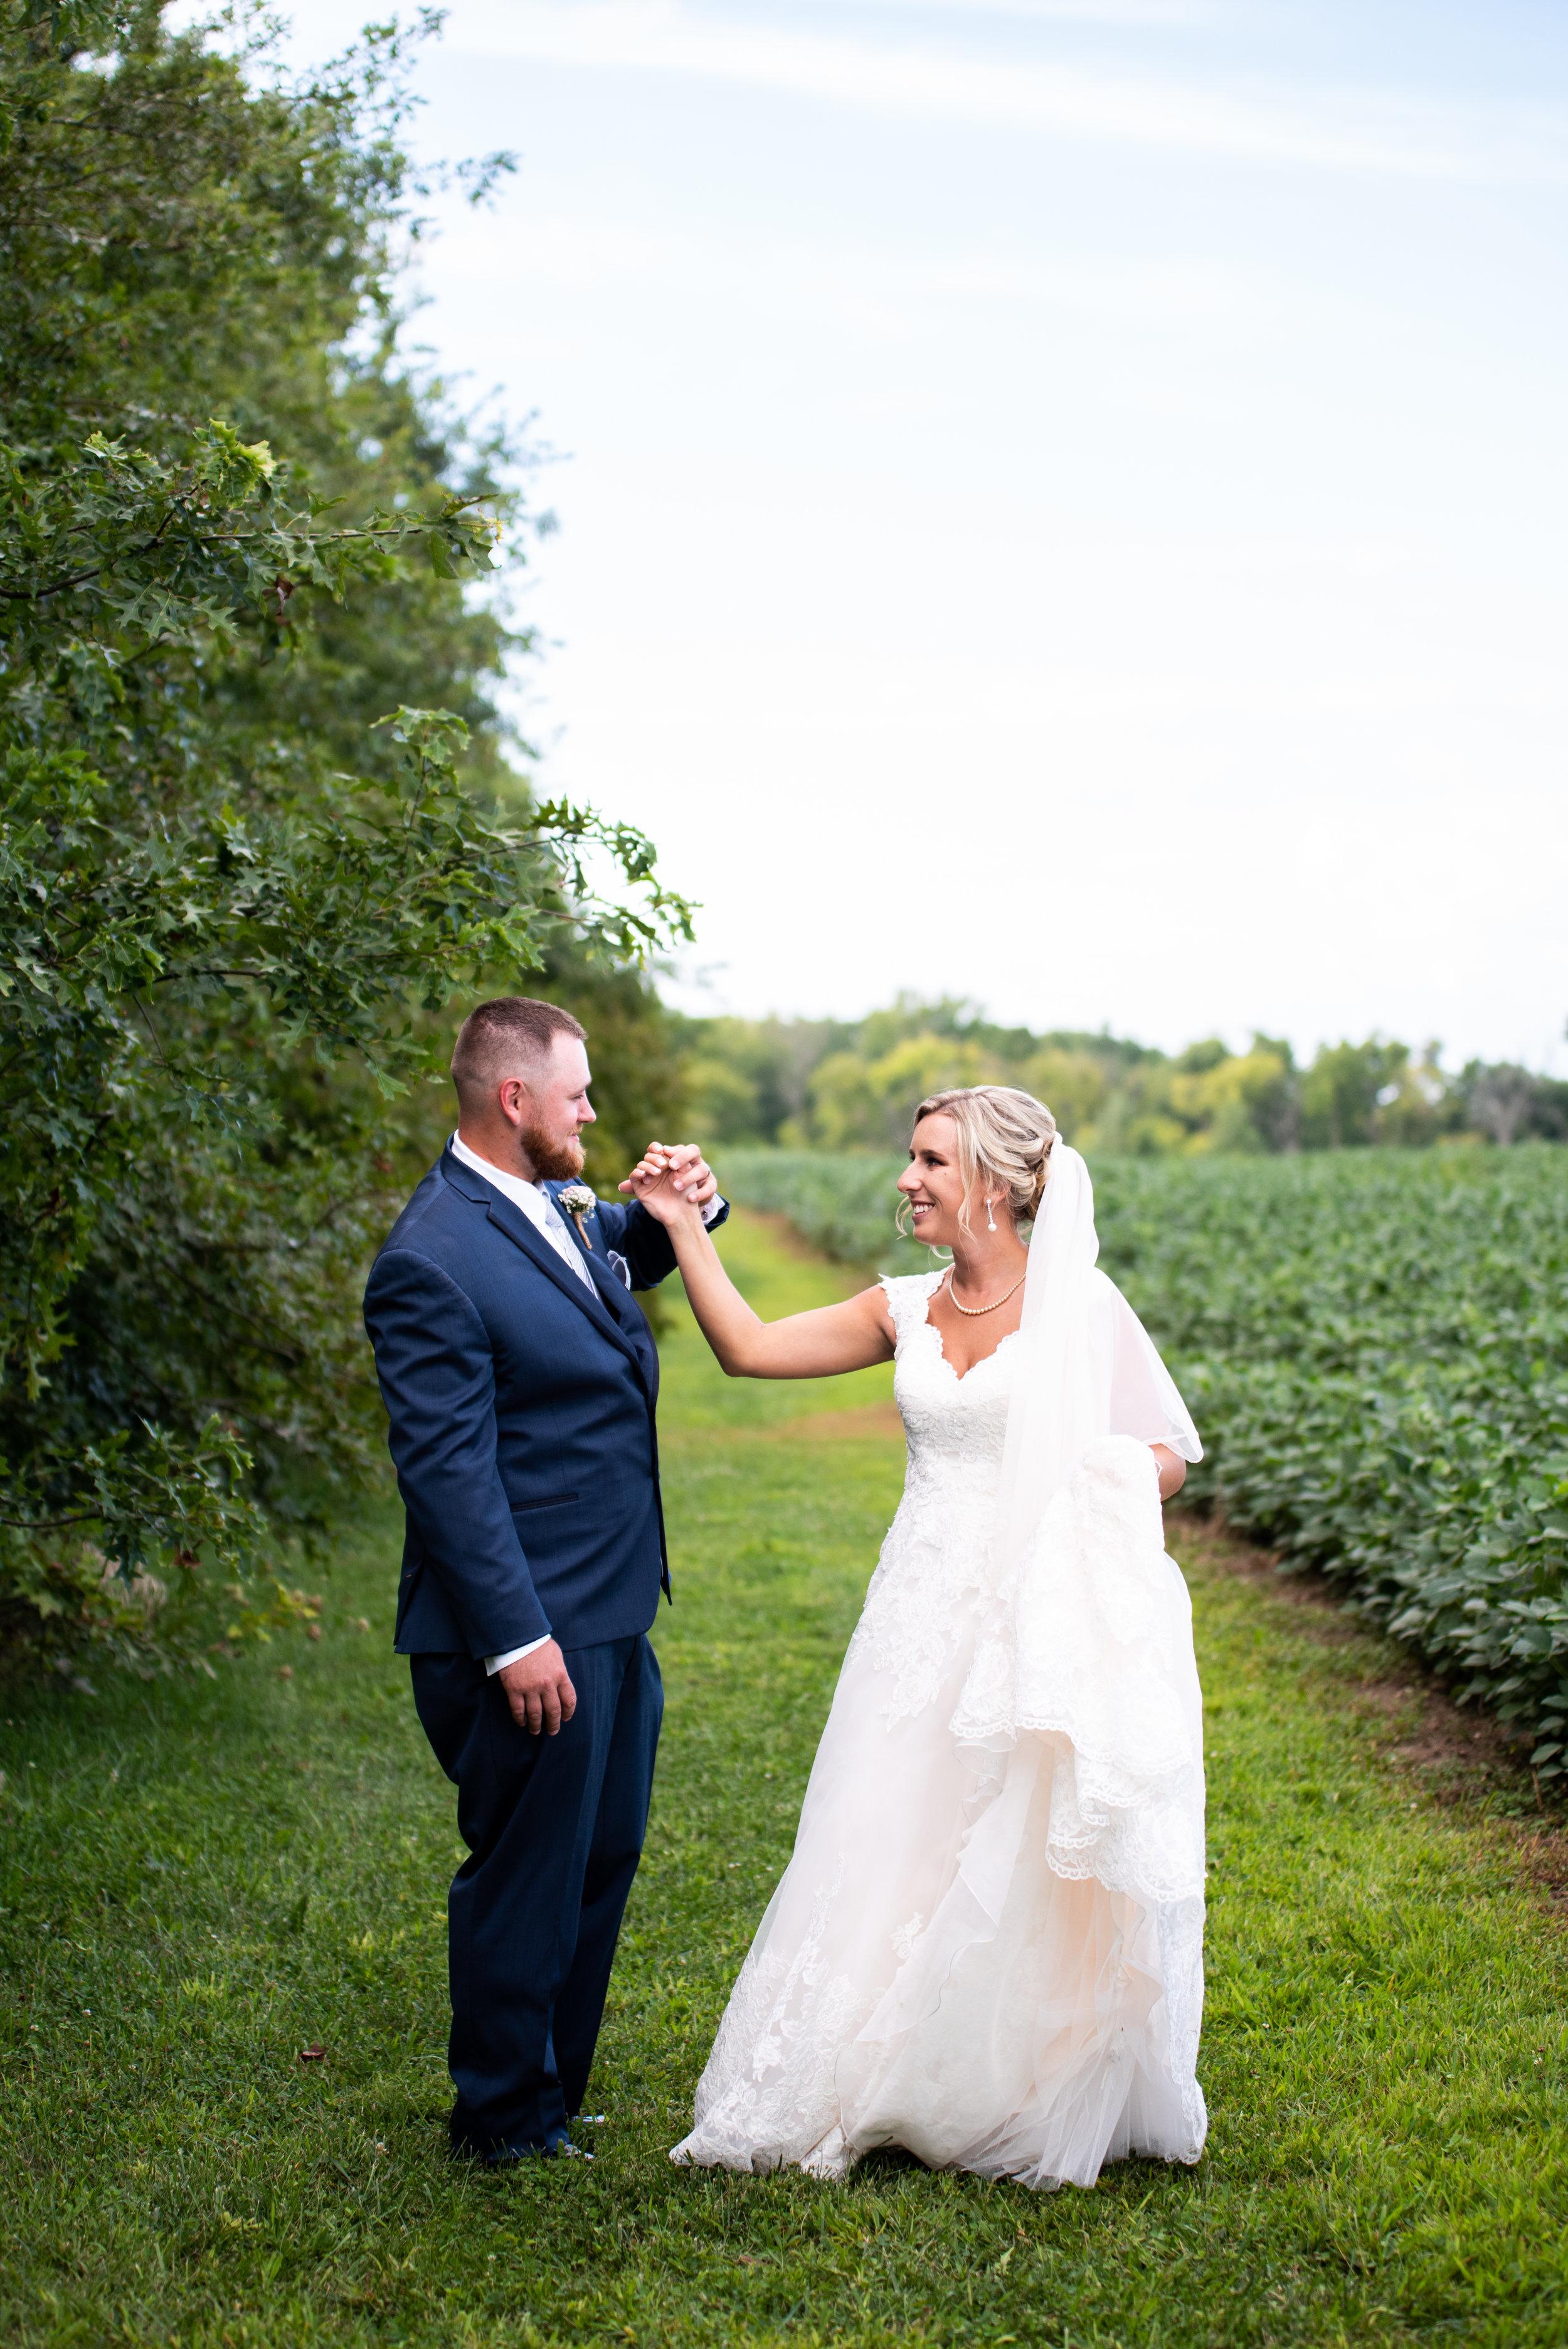 wedding (1 of 1)-166.jpg